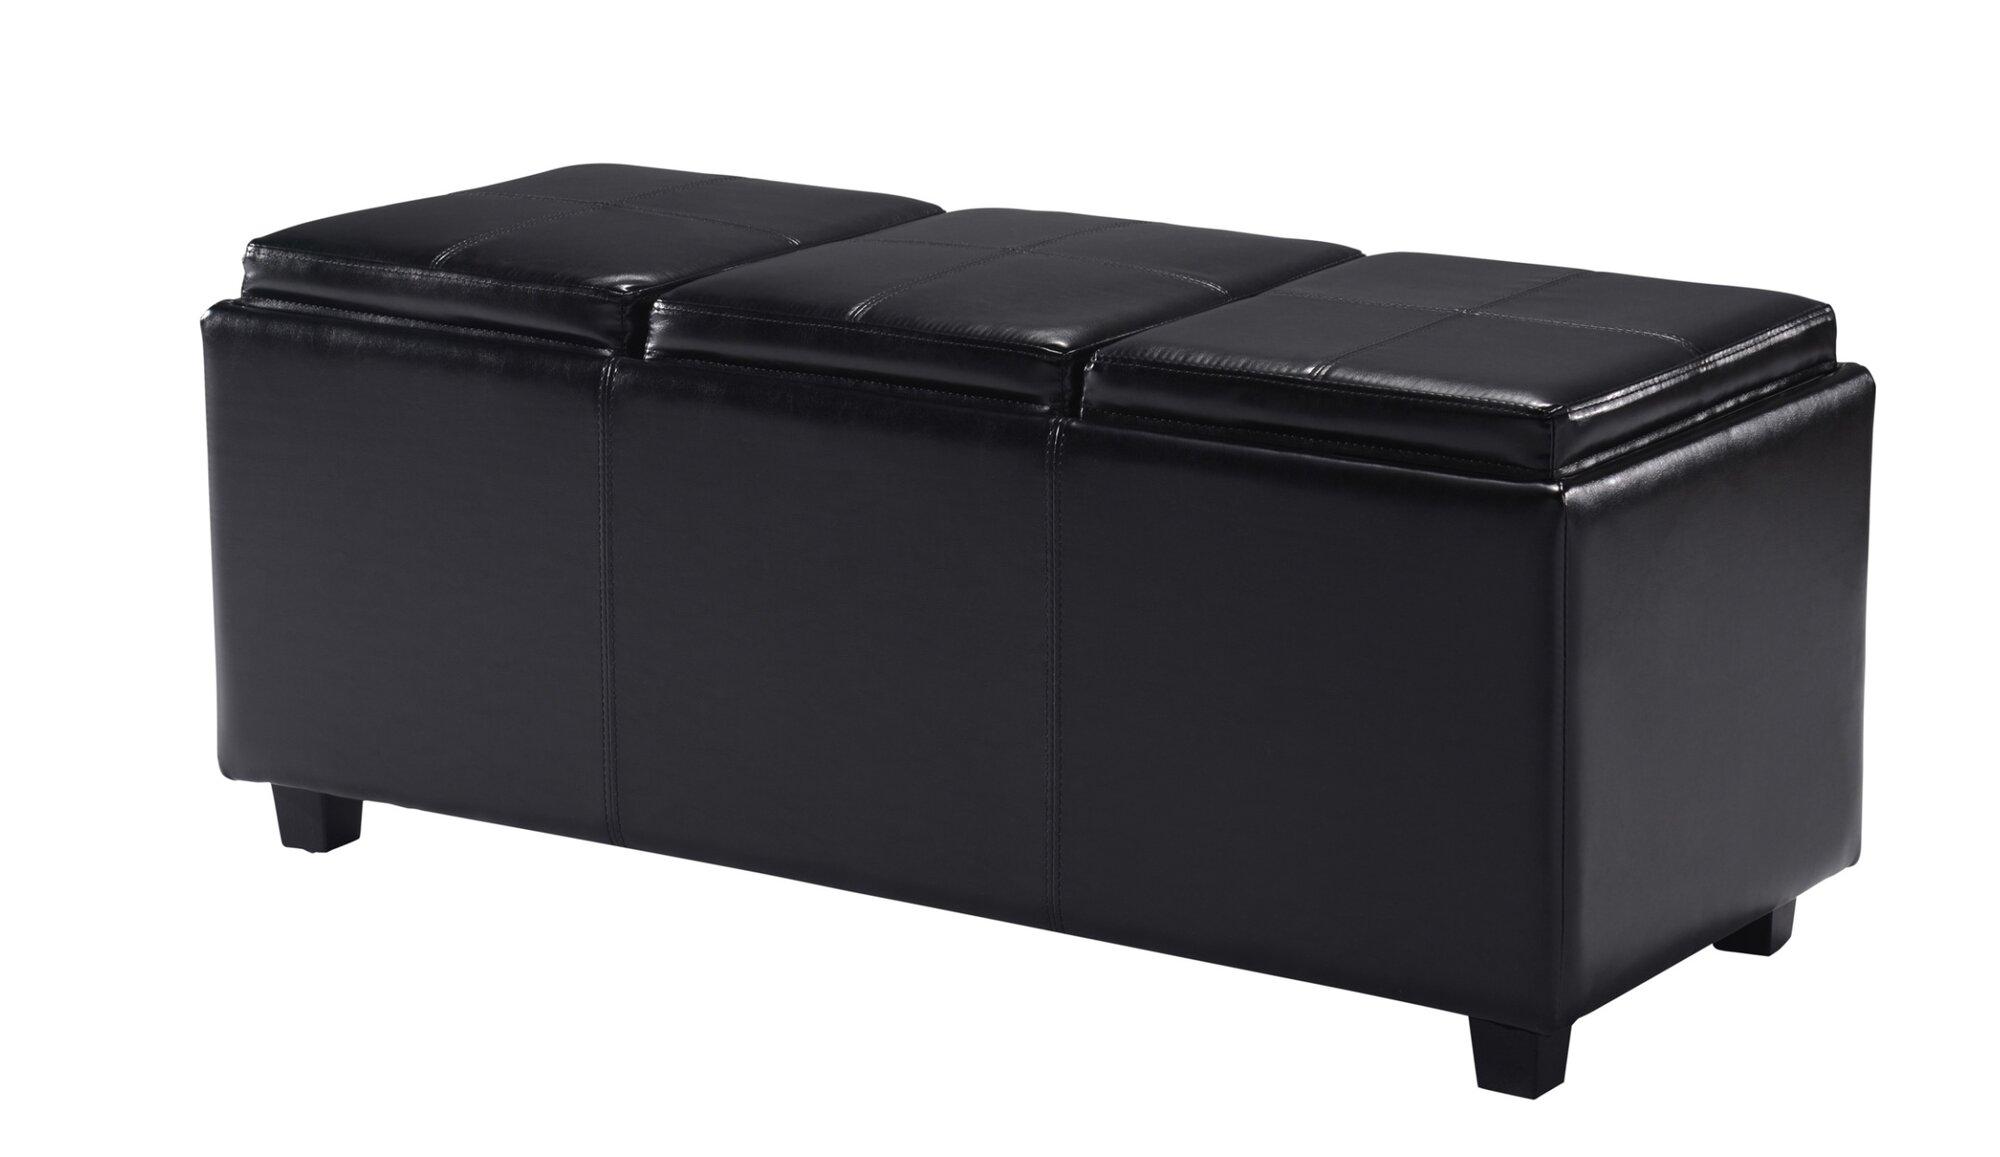 simpli home avalon rectangular storage ottoman with 3 serving trays. Black Bedroom Furniture Sets. Home Design Ideas